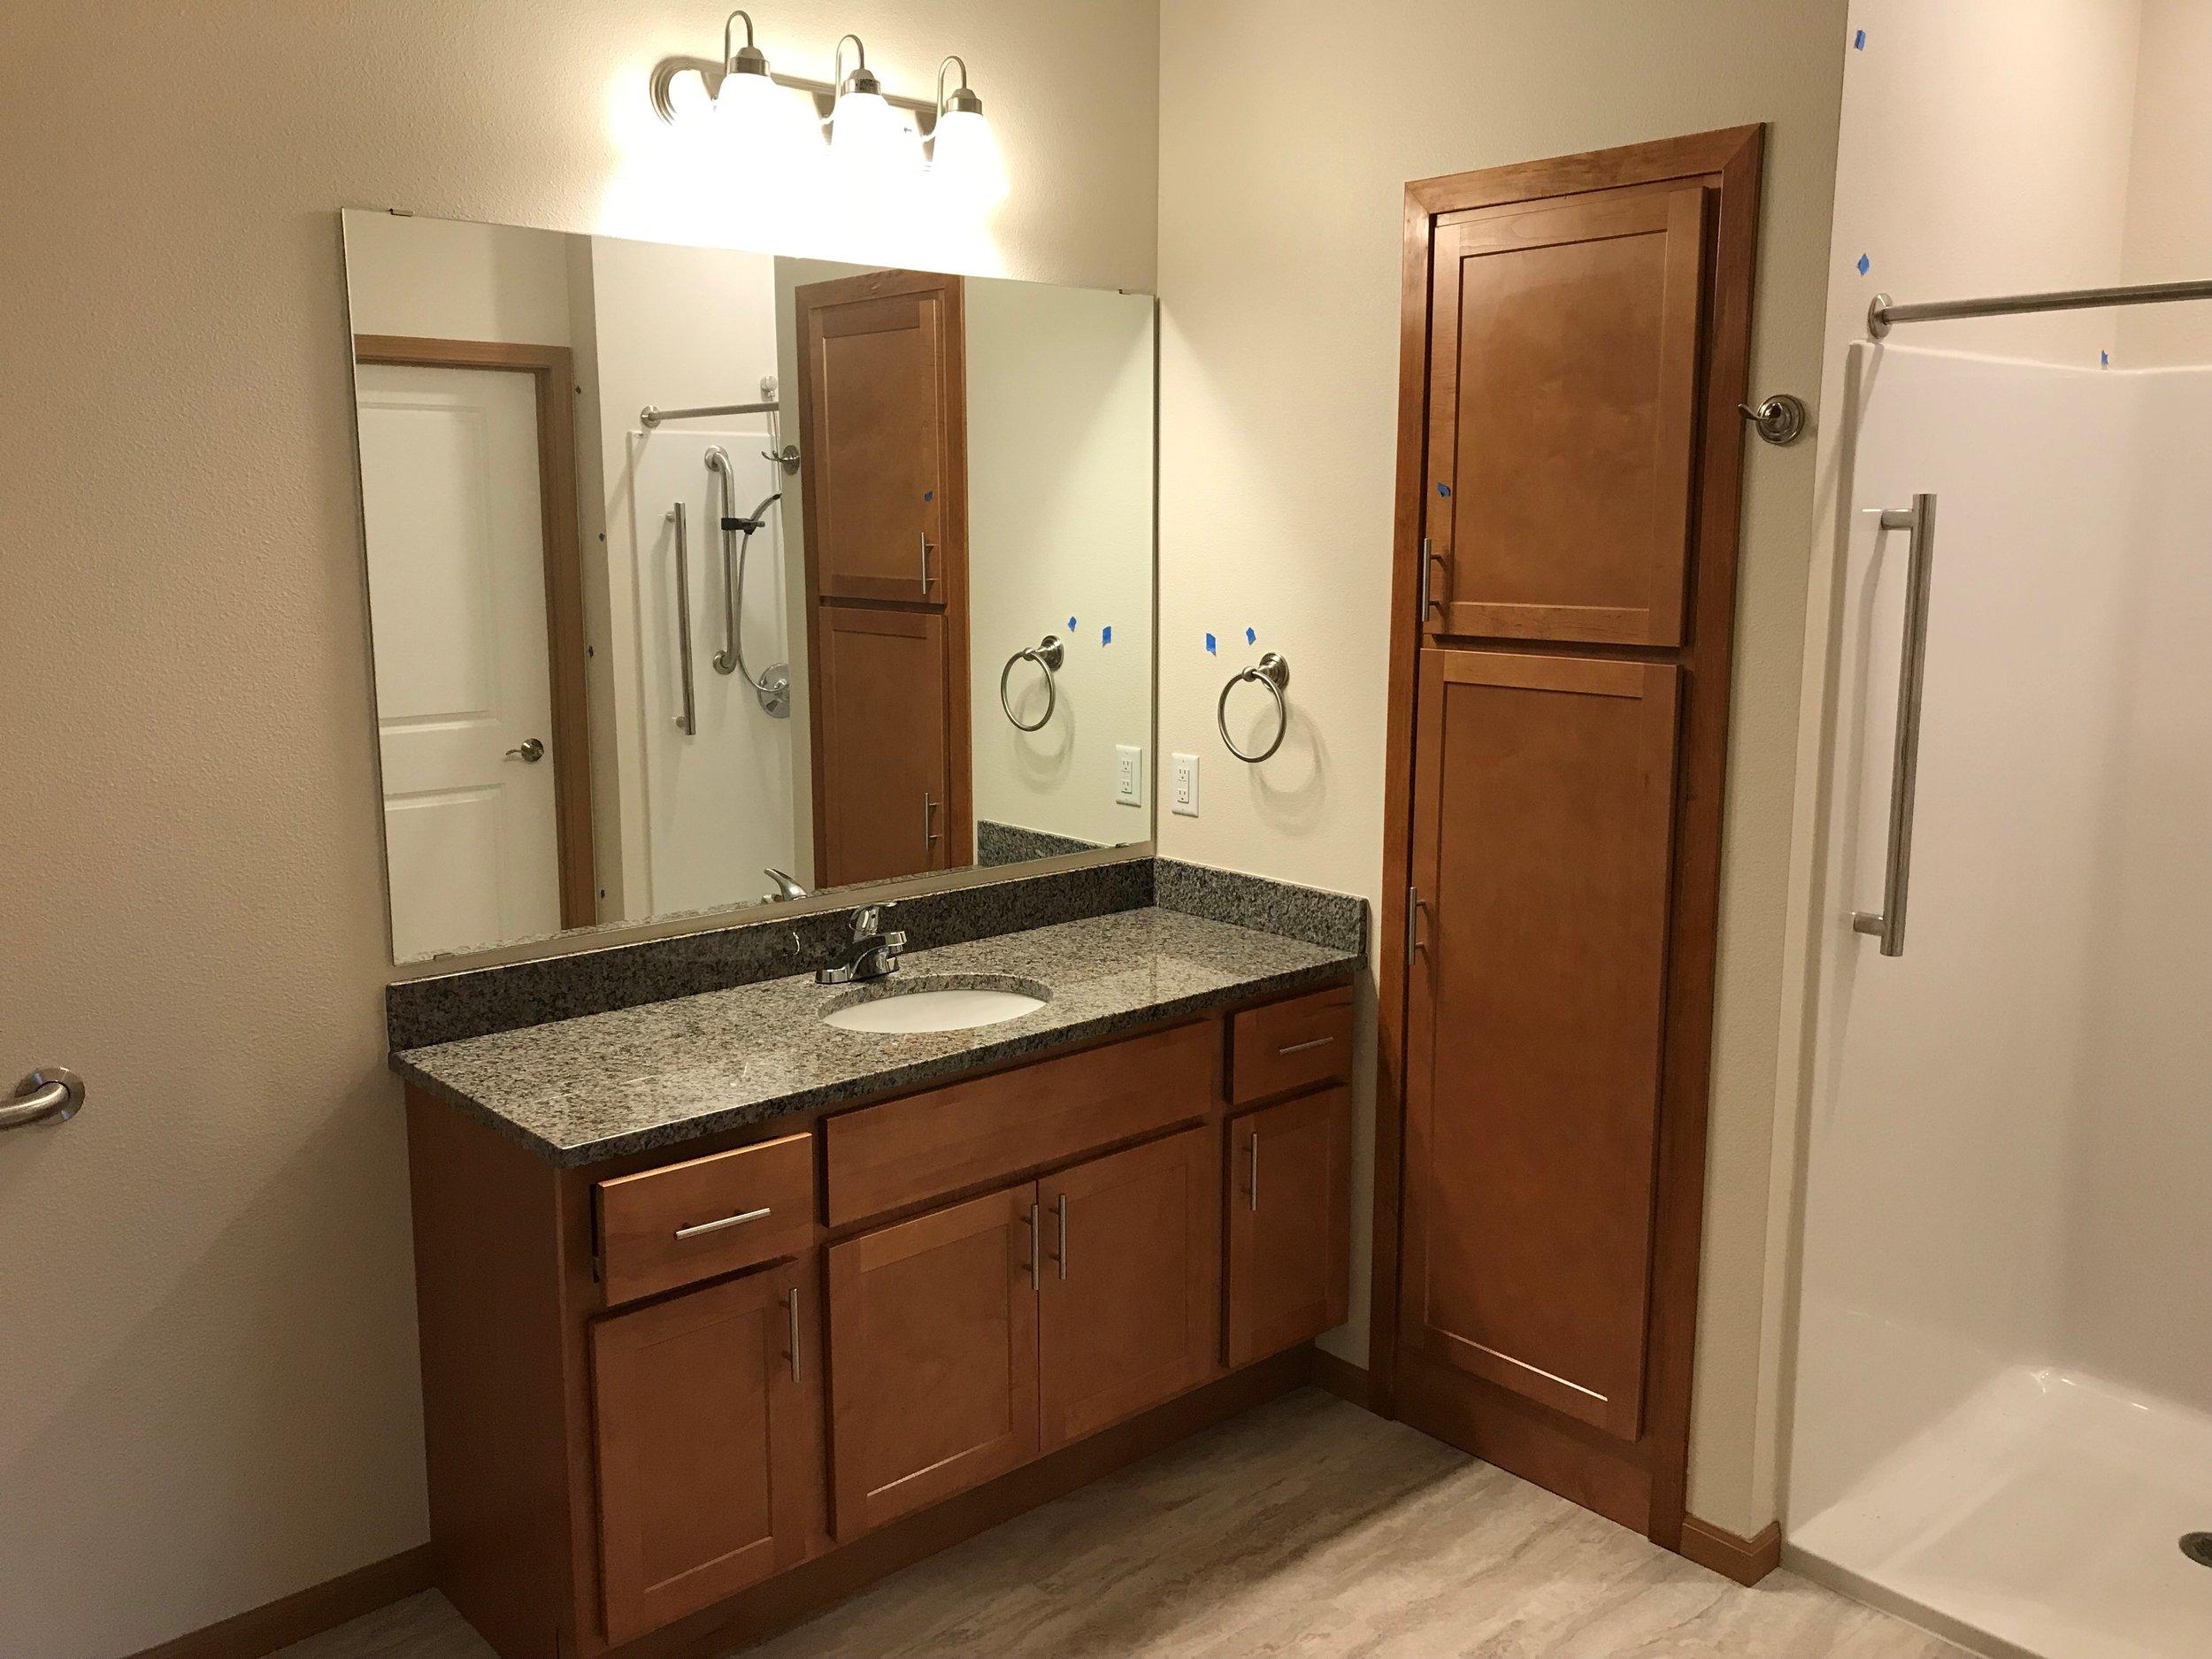 Unit Bathroom.jpg